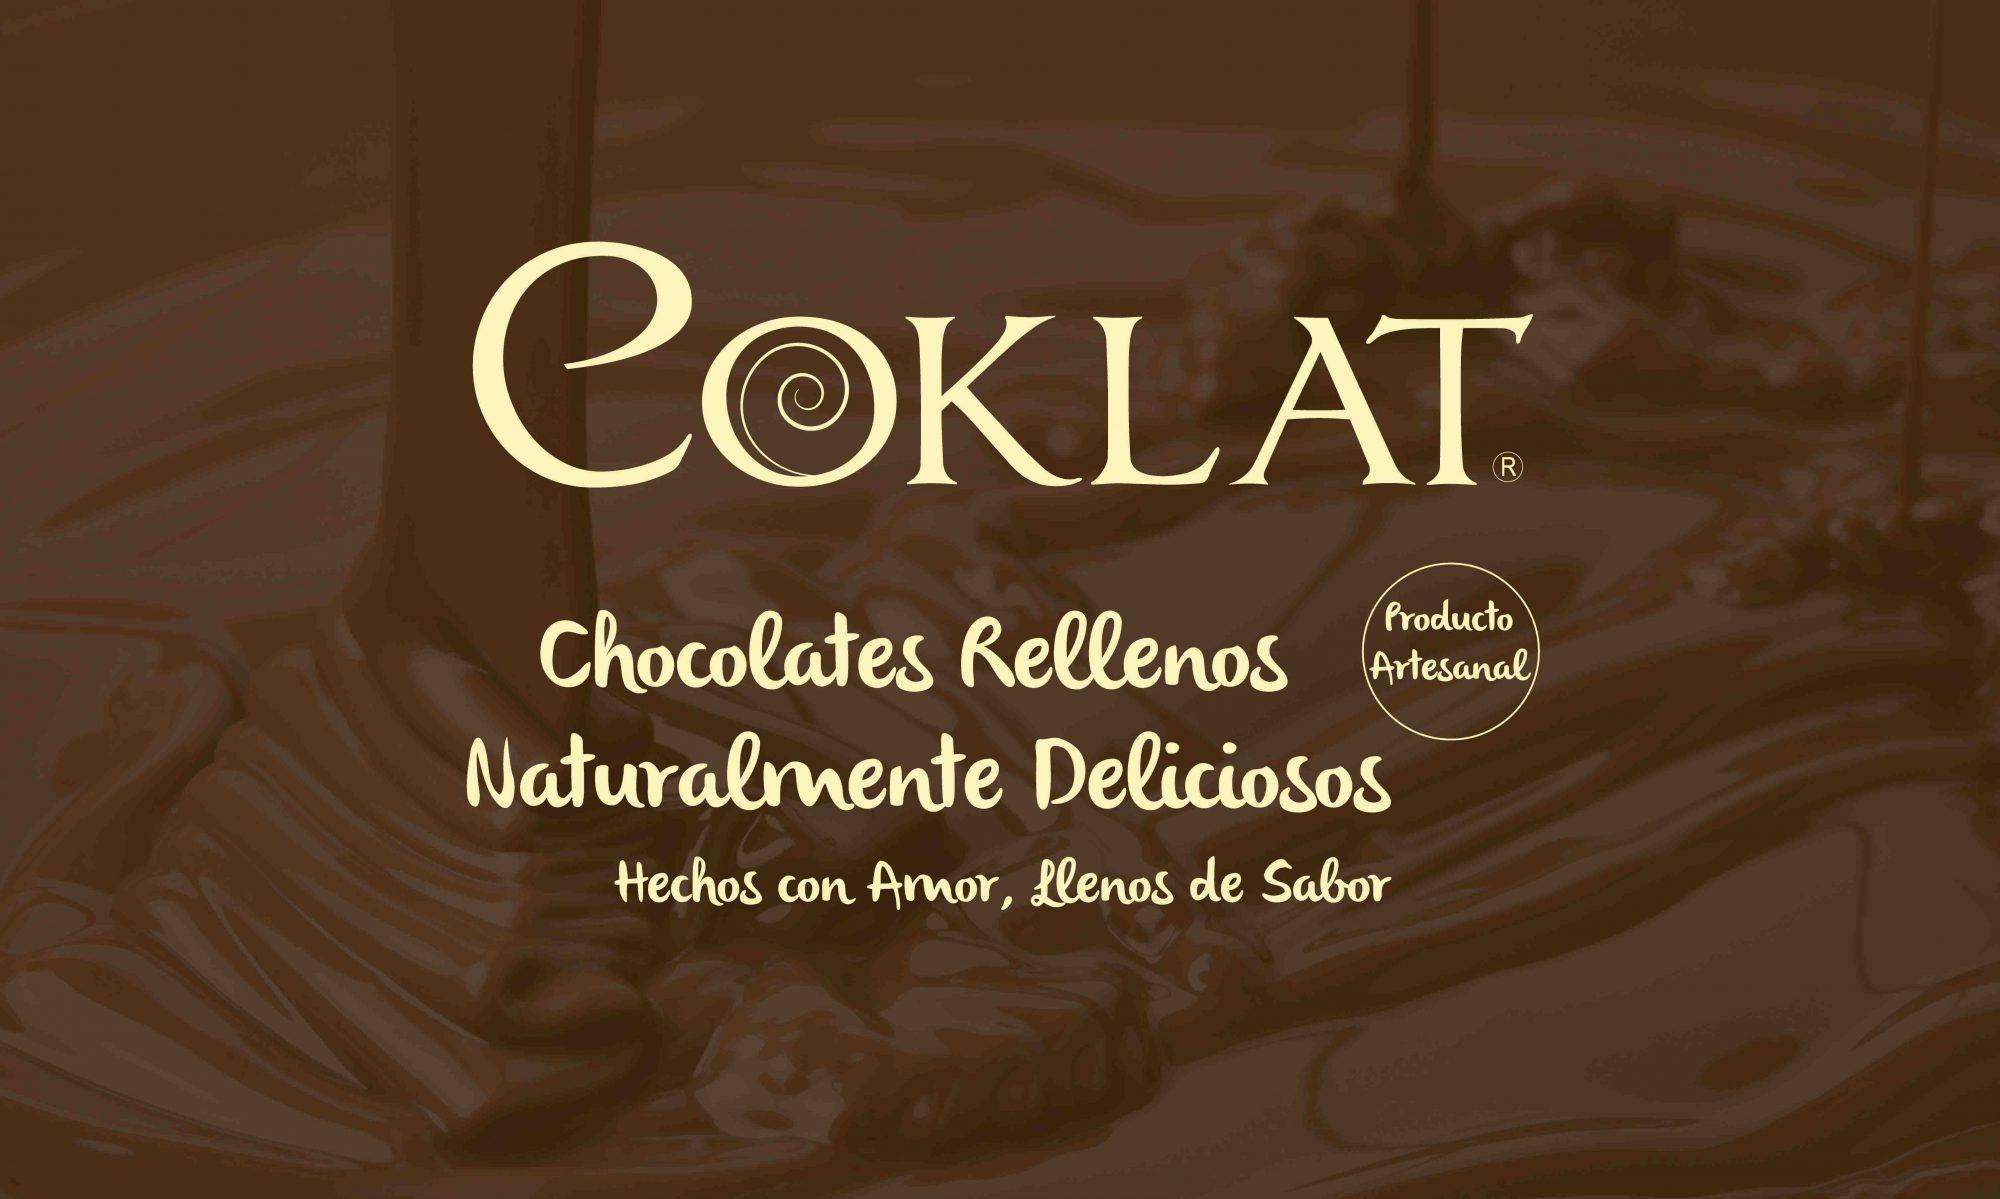 Coklat Chocolates